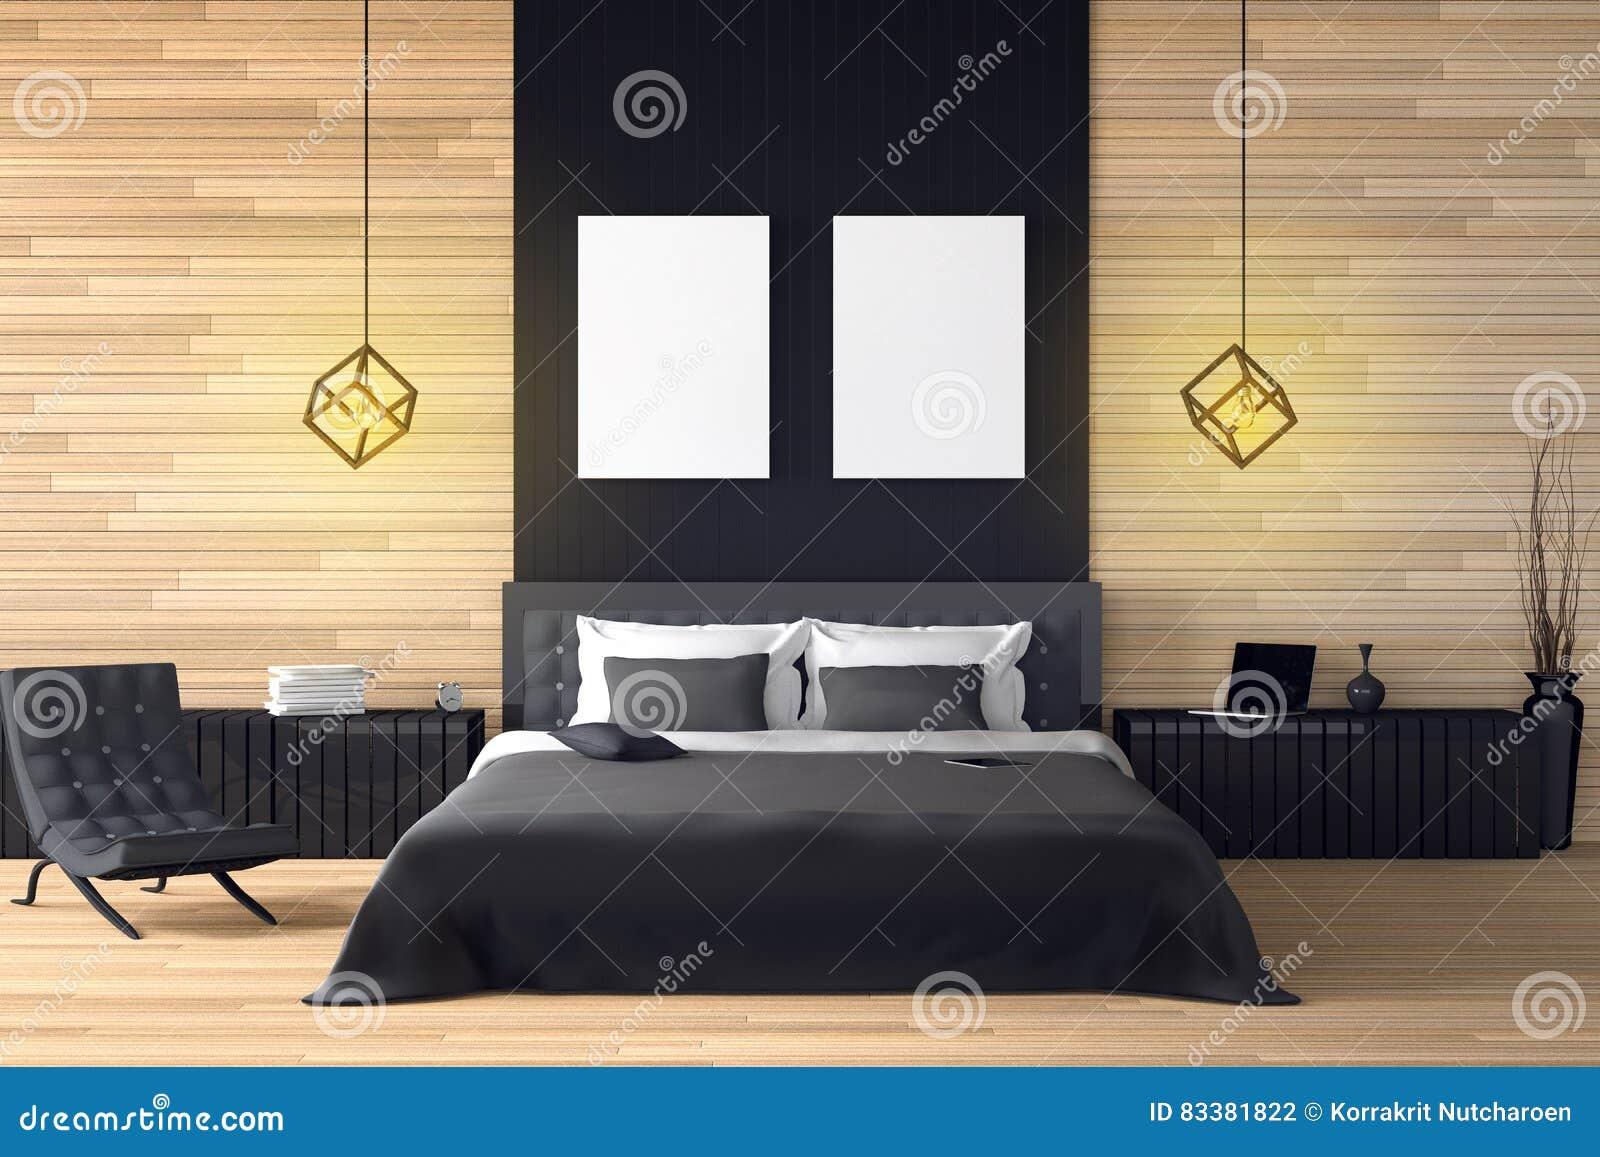 3d Rendering Illustration Of Modern Wooden House